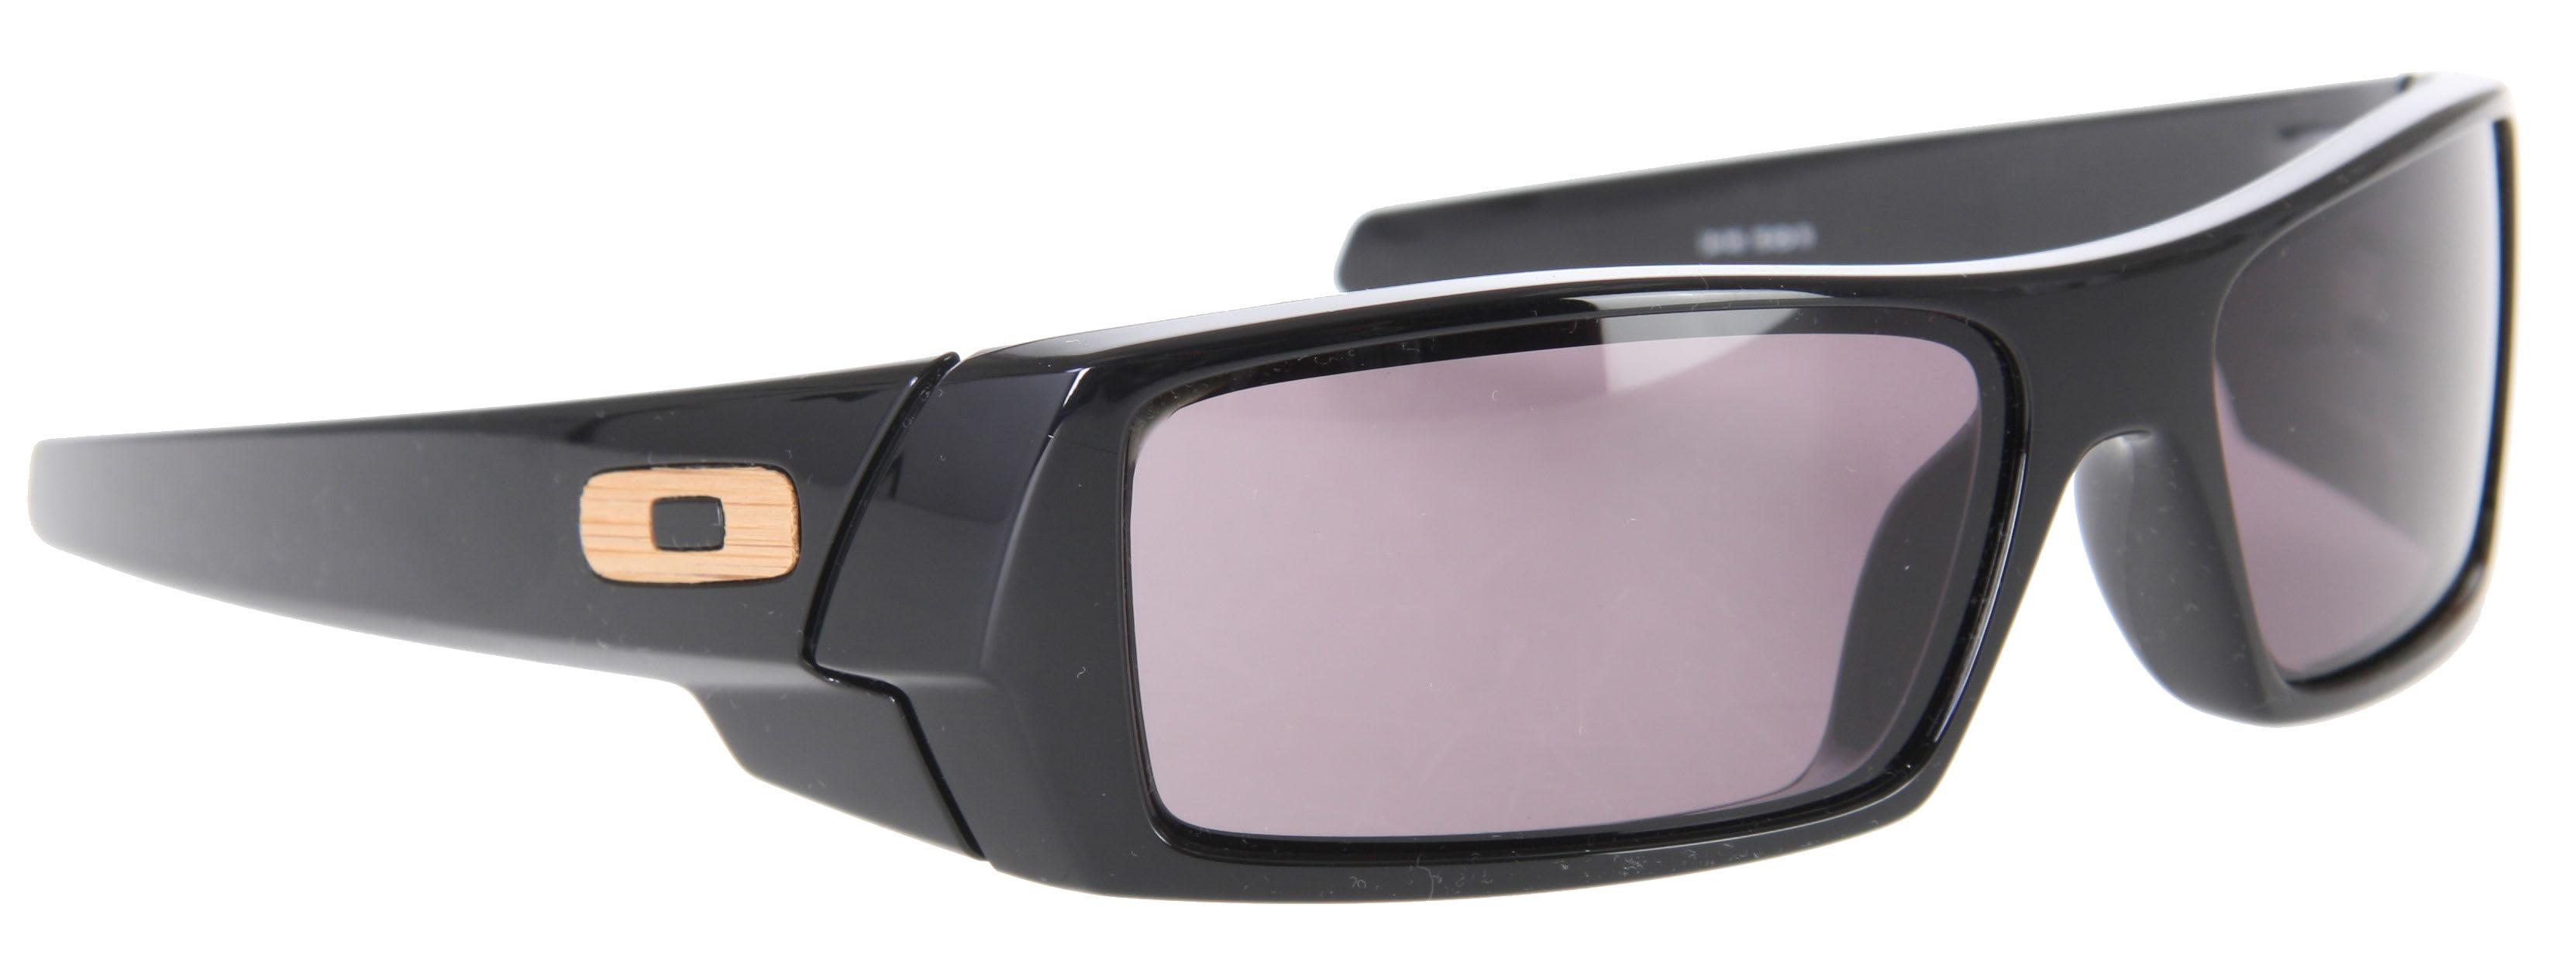 64ba44898e Oakley Gascan Burnquist Sign Sunglasses - thumbnail 1